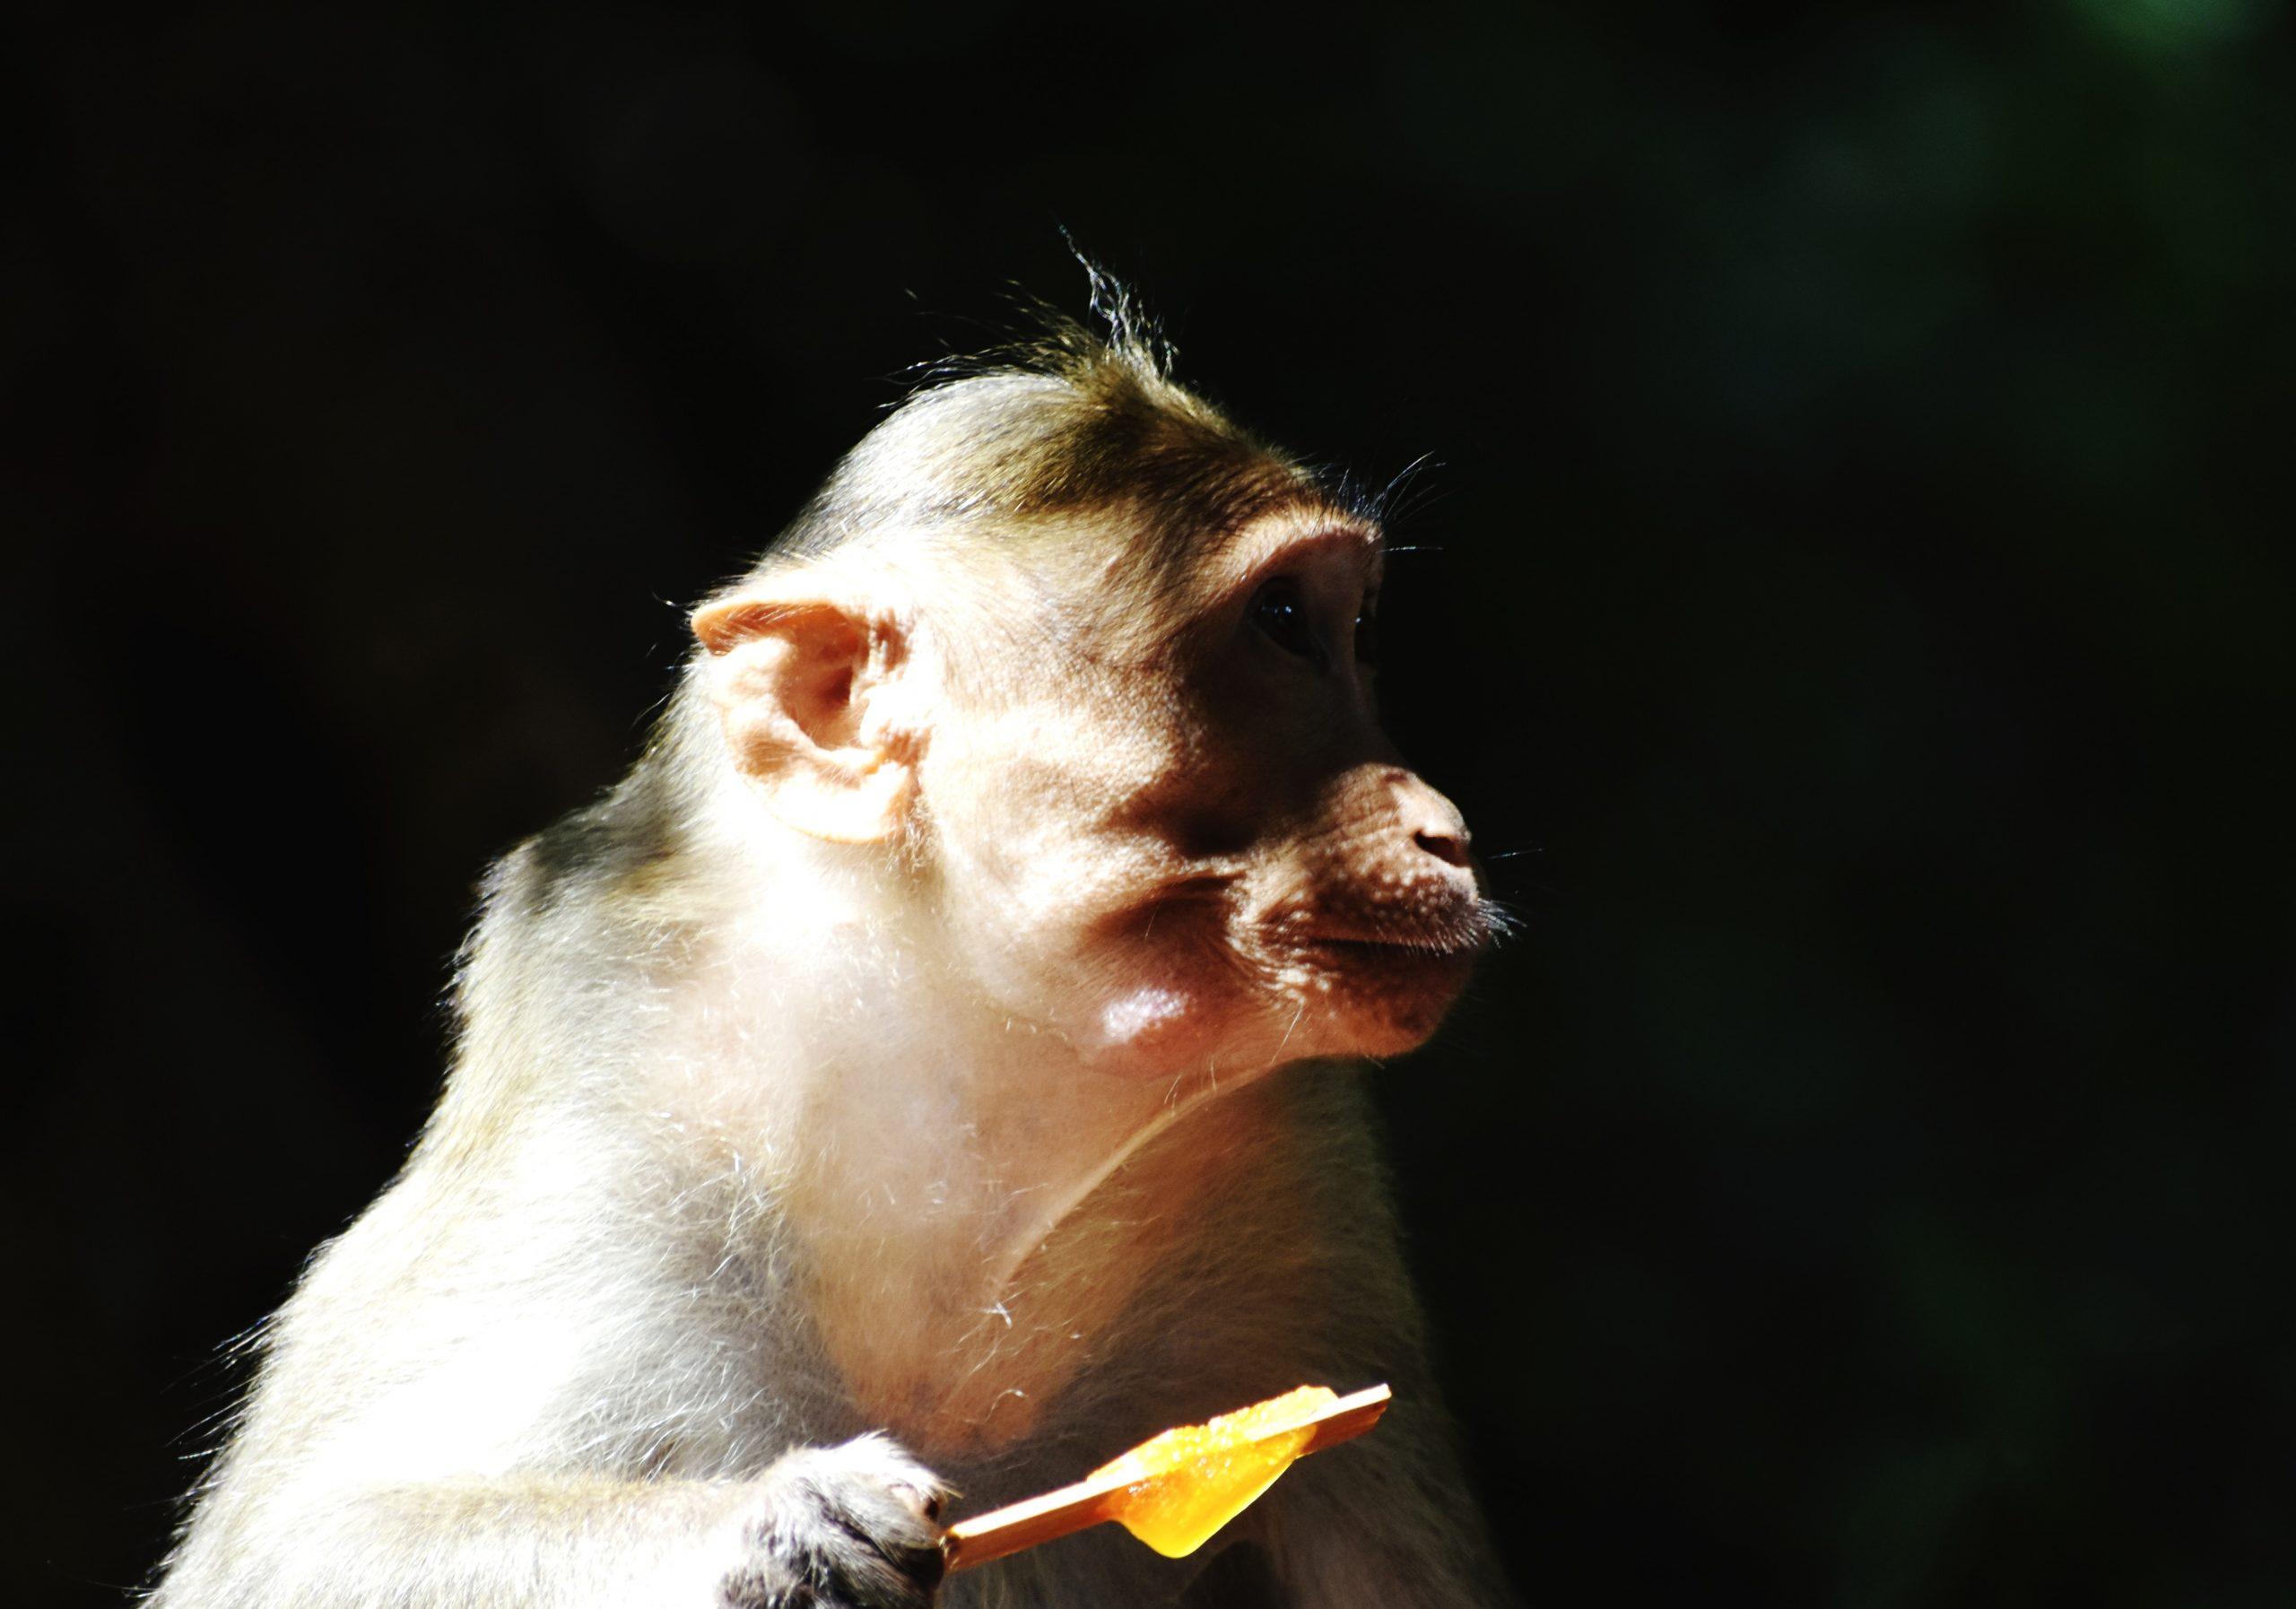 A monkey eating ice pop